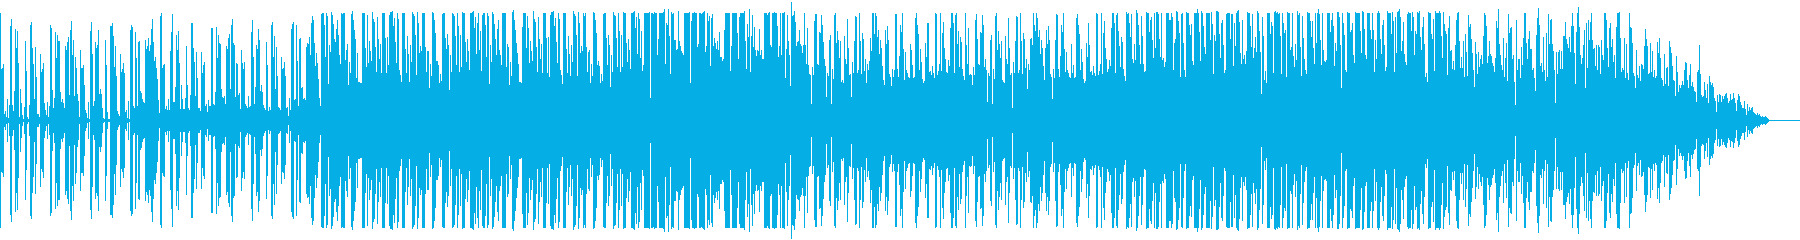 Electro Rock の2の再生済みの波形